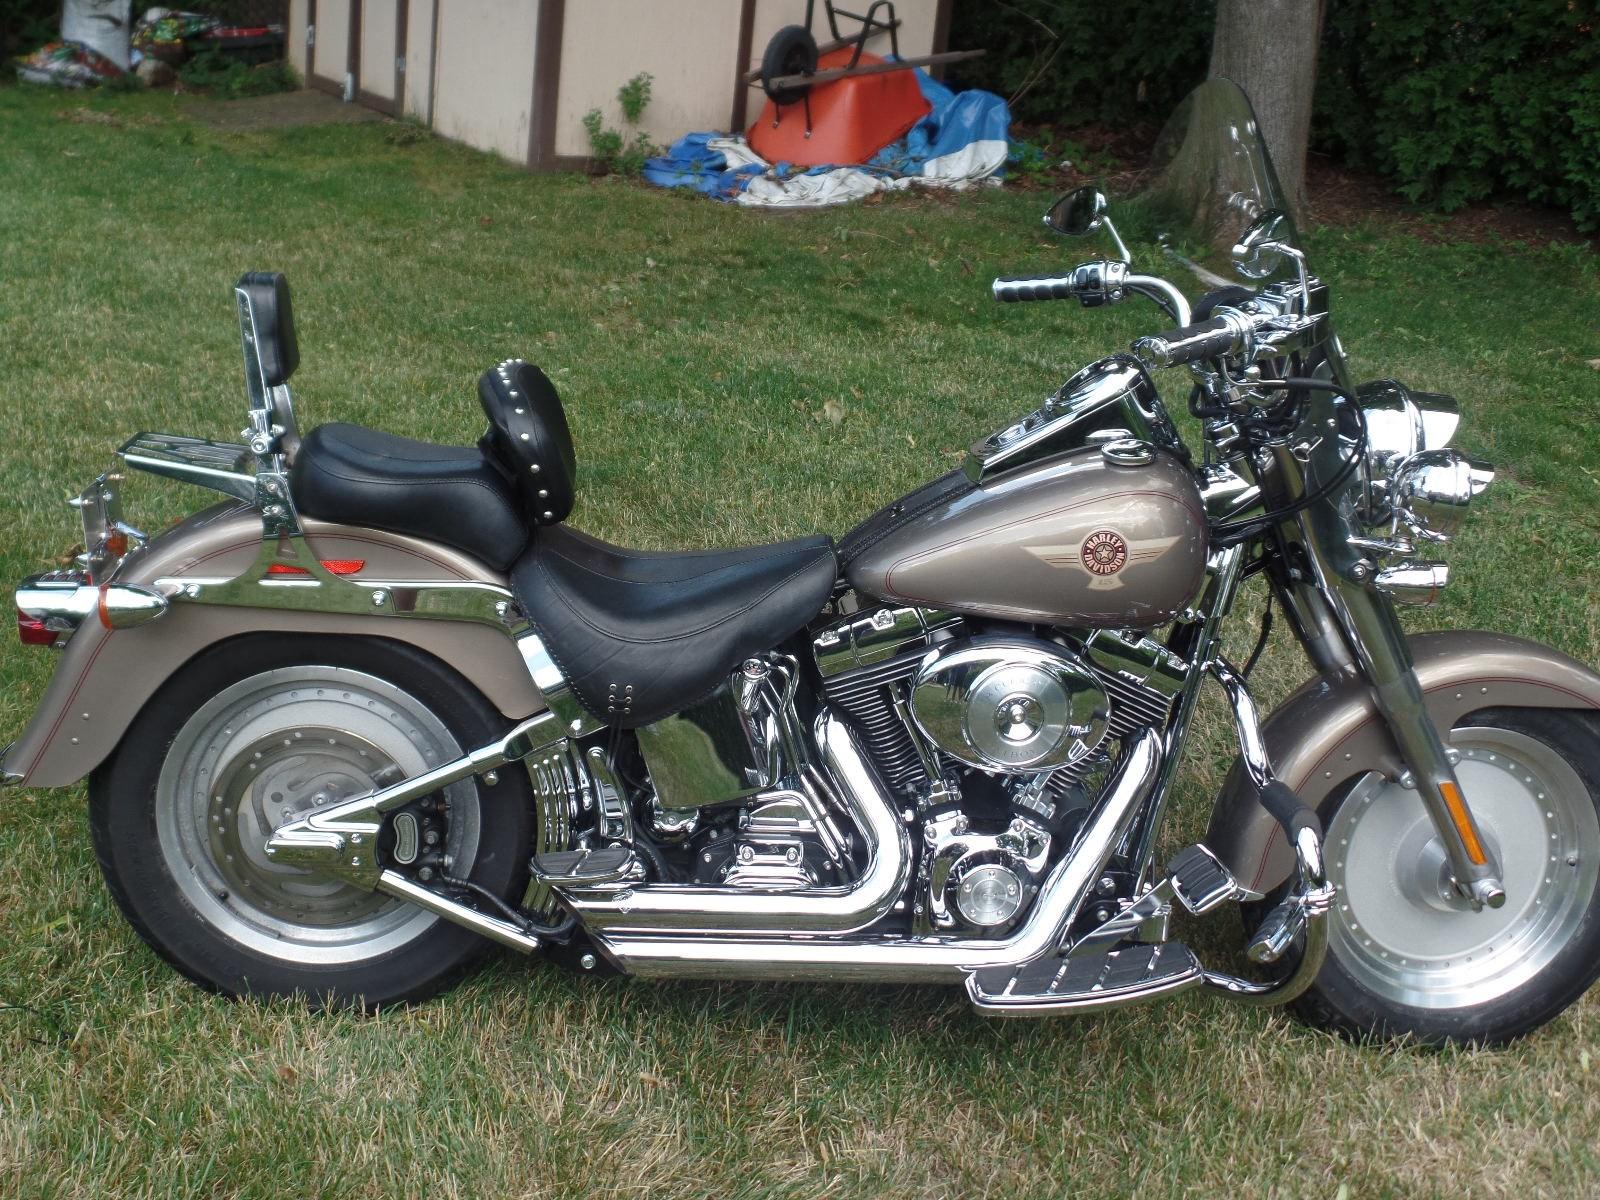 Harley Davidson Fatboy Th Anniversary Edition